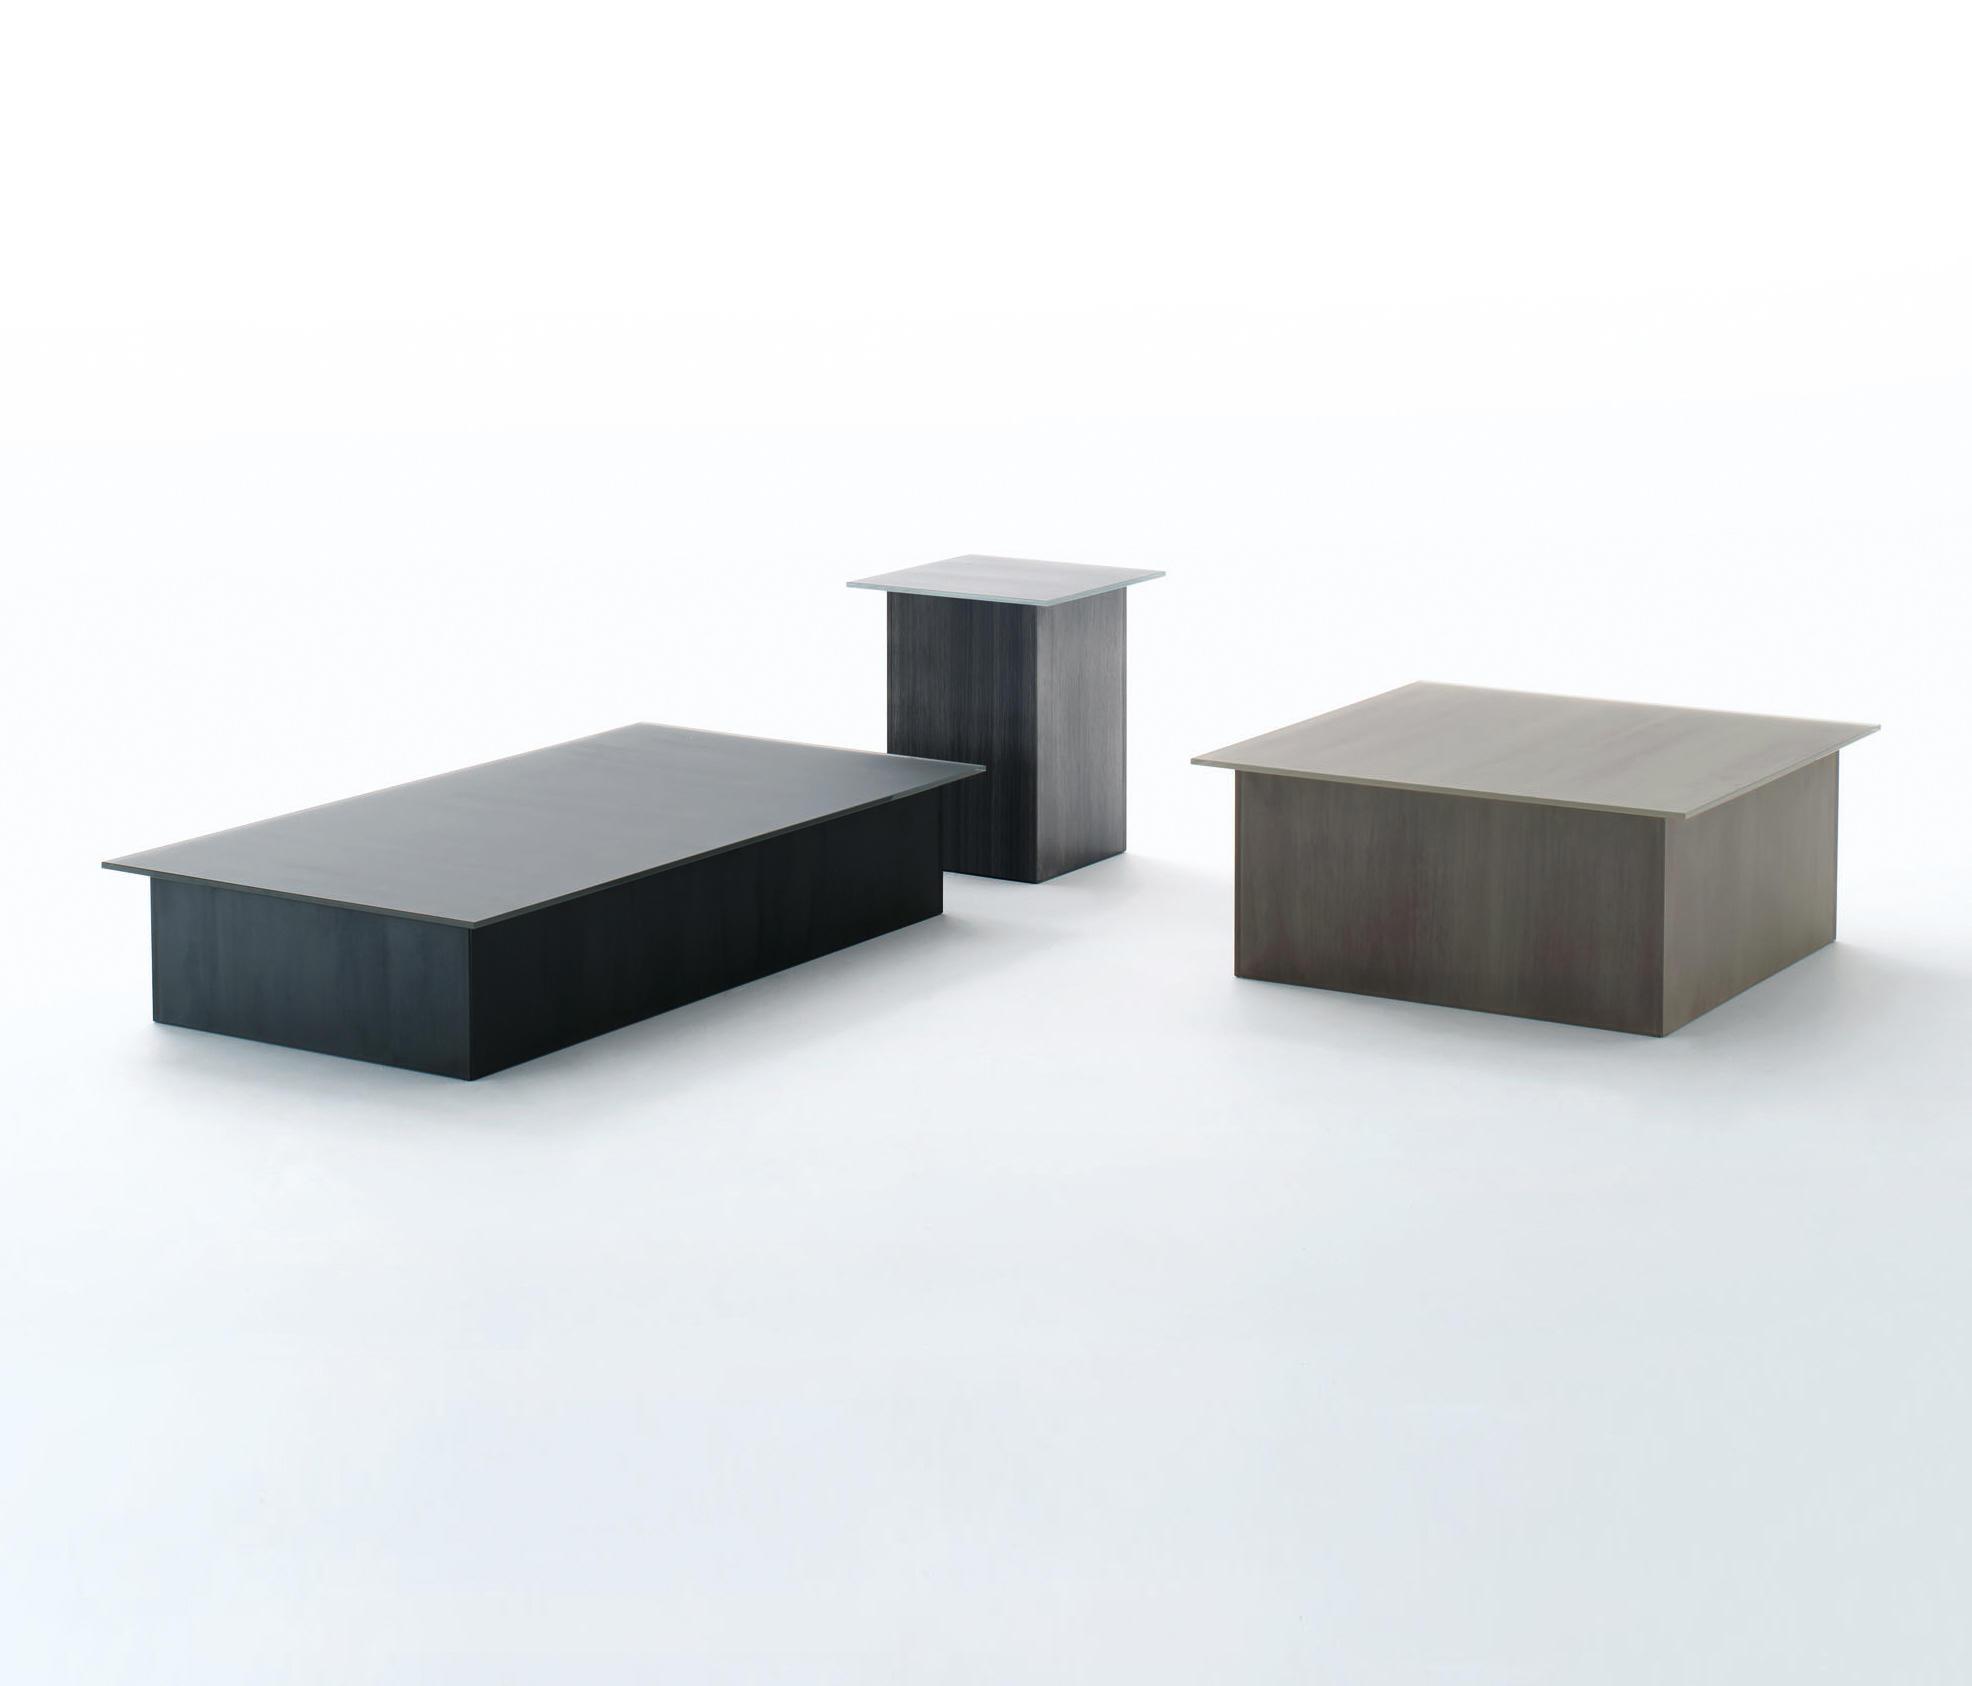 BRUSHSTROKE Meeting room tables from Glas Italia  : brushstroke 4 b from www.architonic.com size 1972 x 1686 jpeg 98kB